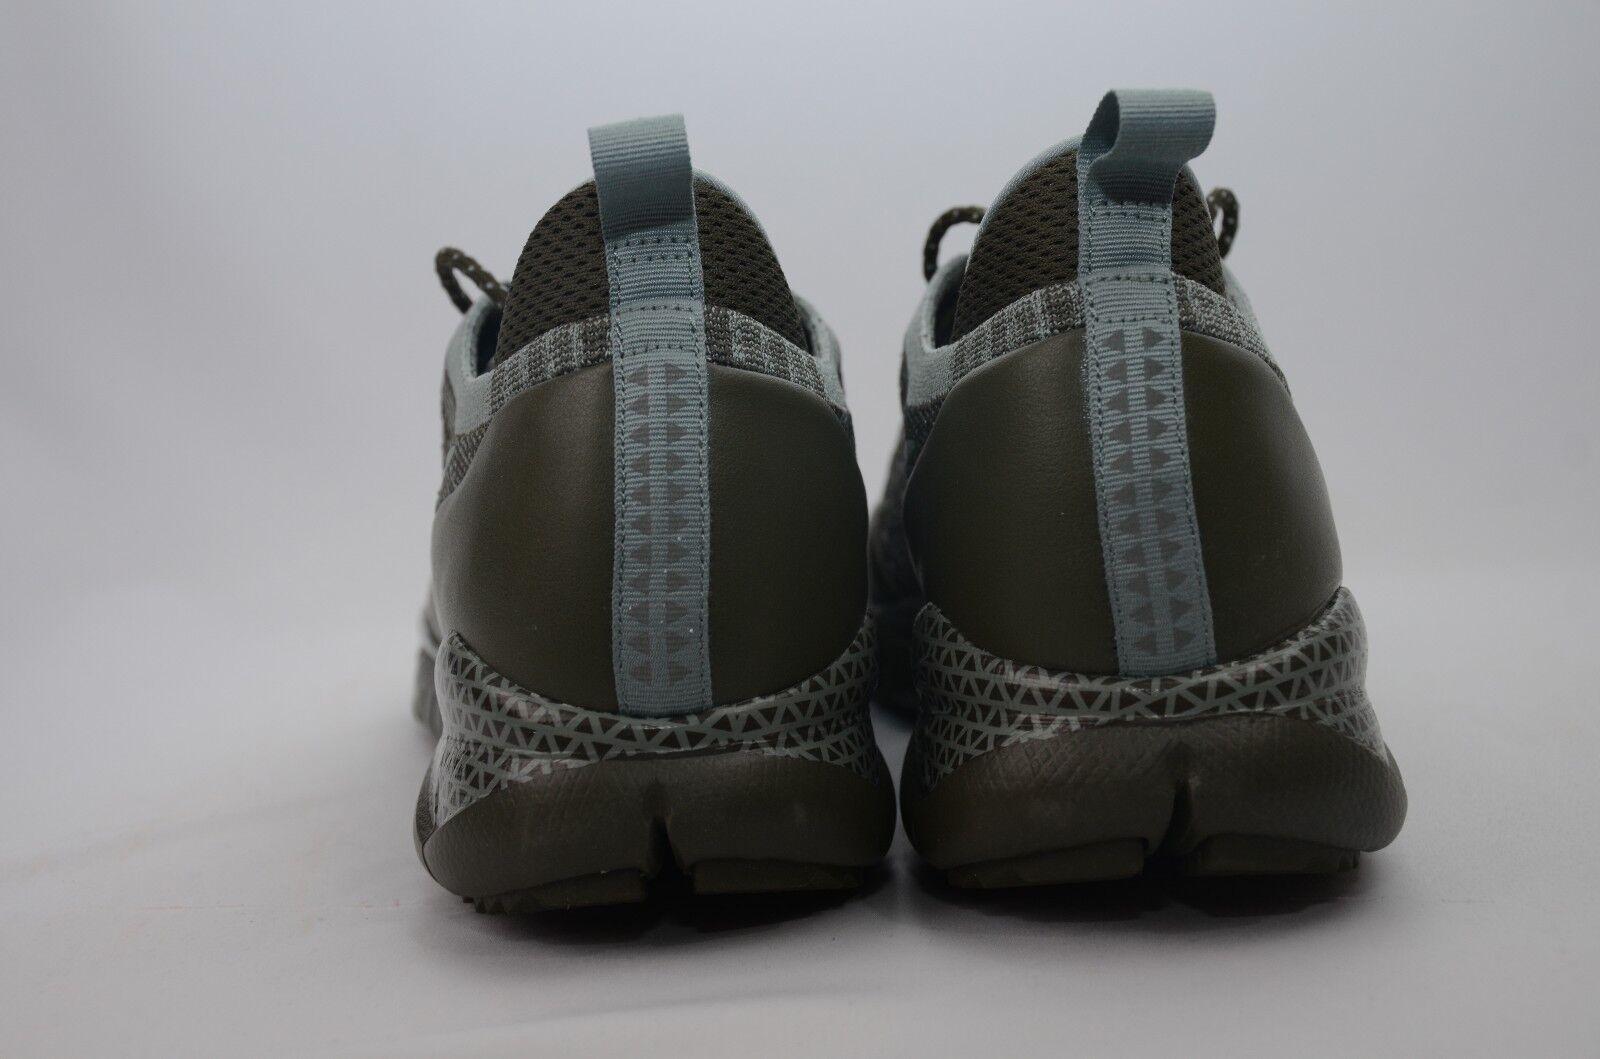 Nike Lupinek Flyknit Low Khaki Green Men's Size 9-11 New New New in Box 882685 300 ebad8c